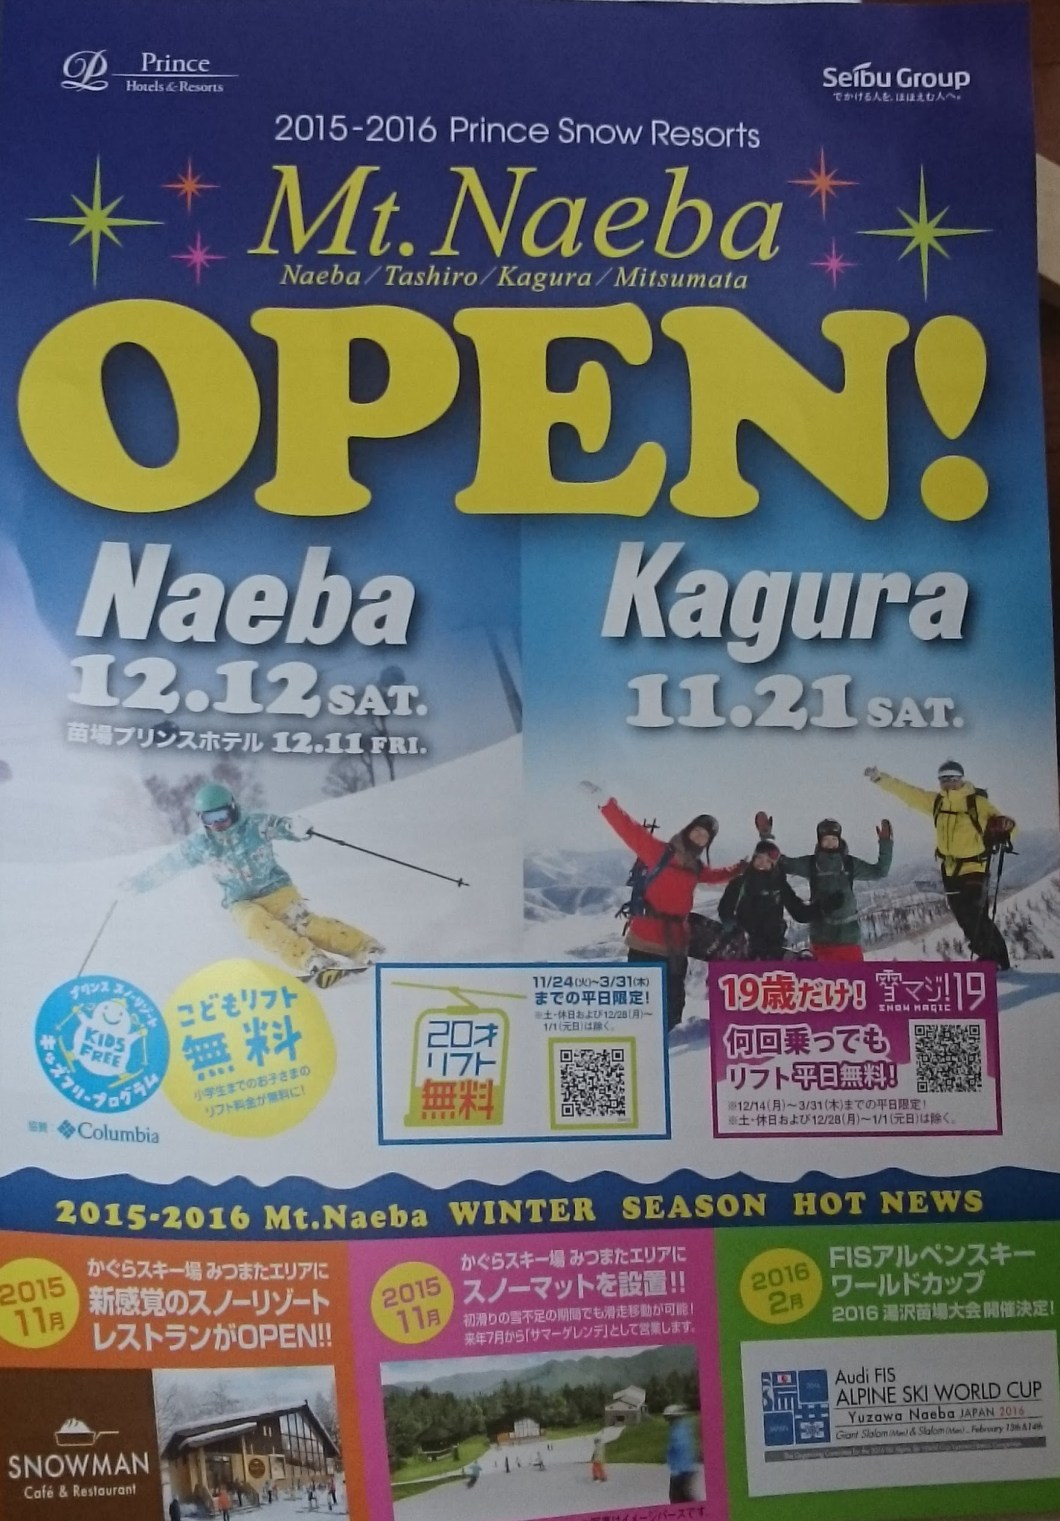 Snow Country Instructors teach ski lessons and snowboard lessons all Mt. Naeba resorts - Naeba, Tashiro, Kagura and Mitsumata.